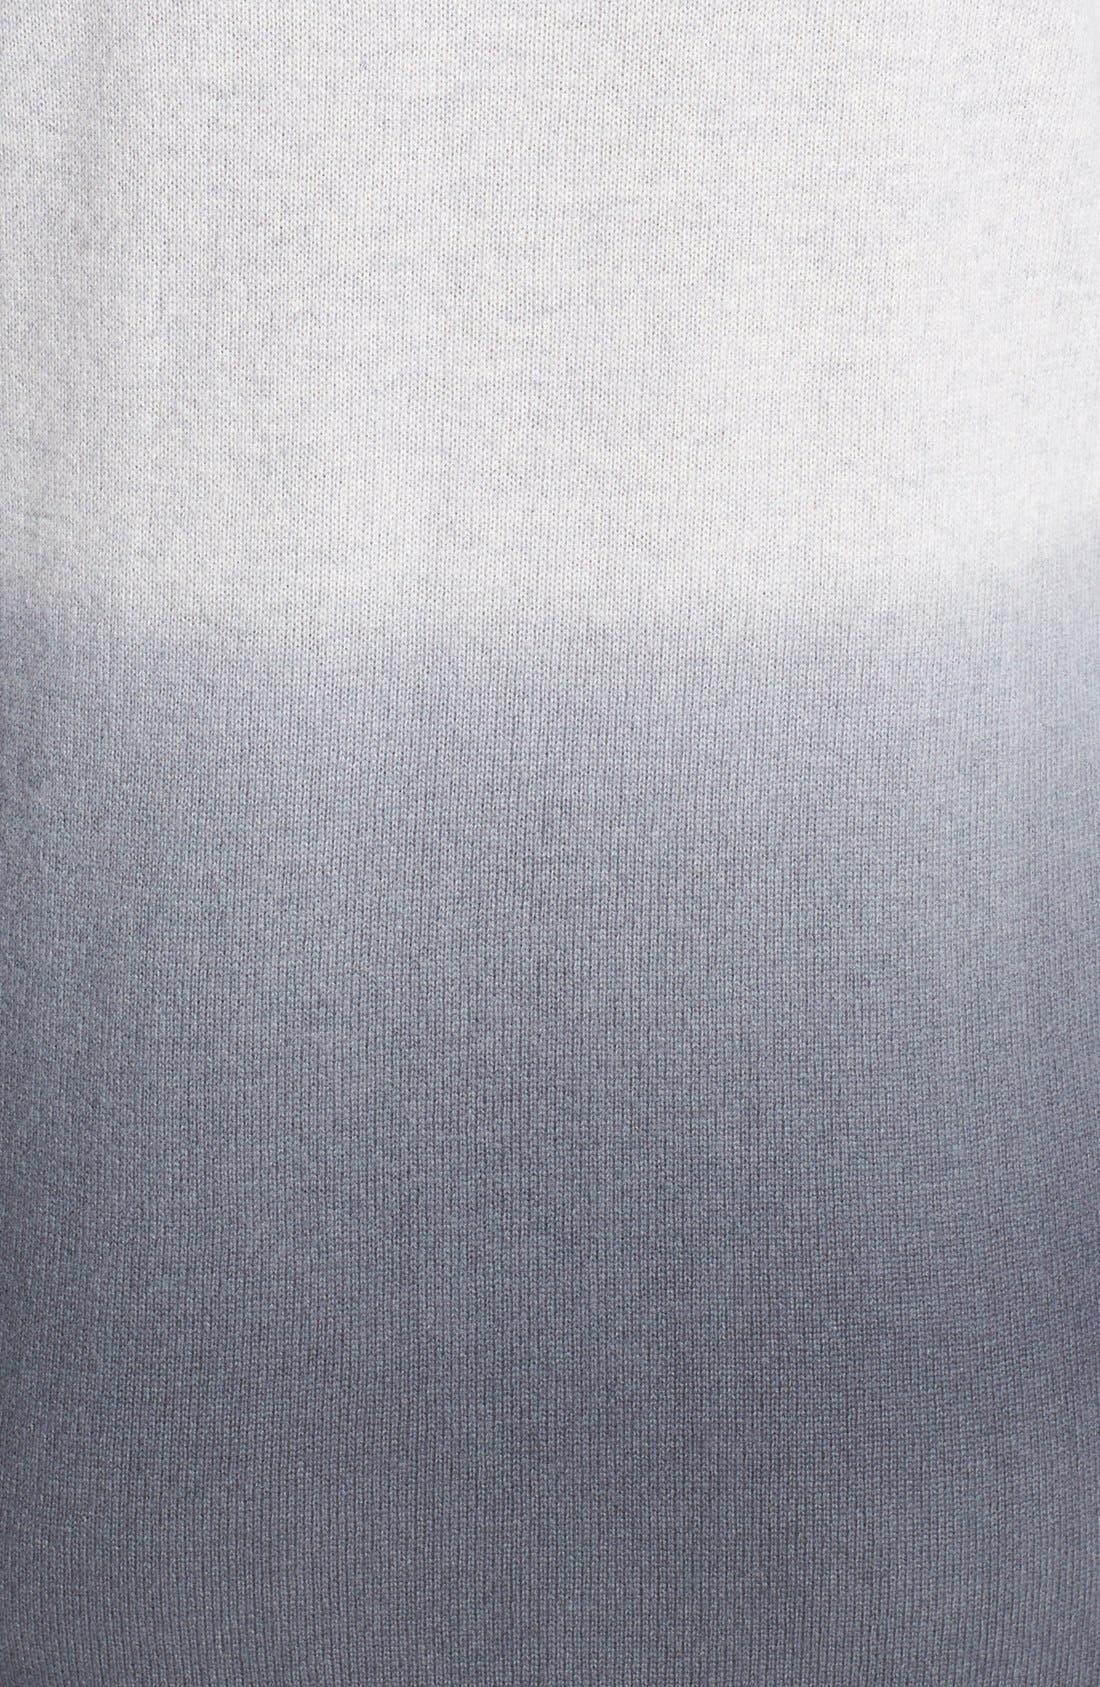 Alternate Image 4  - Only Mine Dip Dye Wool & Cashmere Sweater Dress (Regular & Petite)